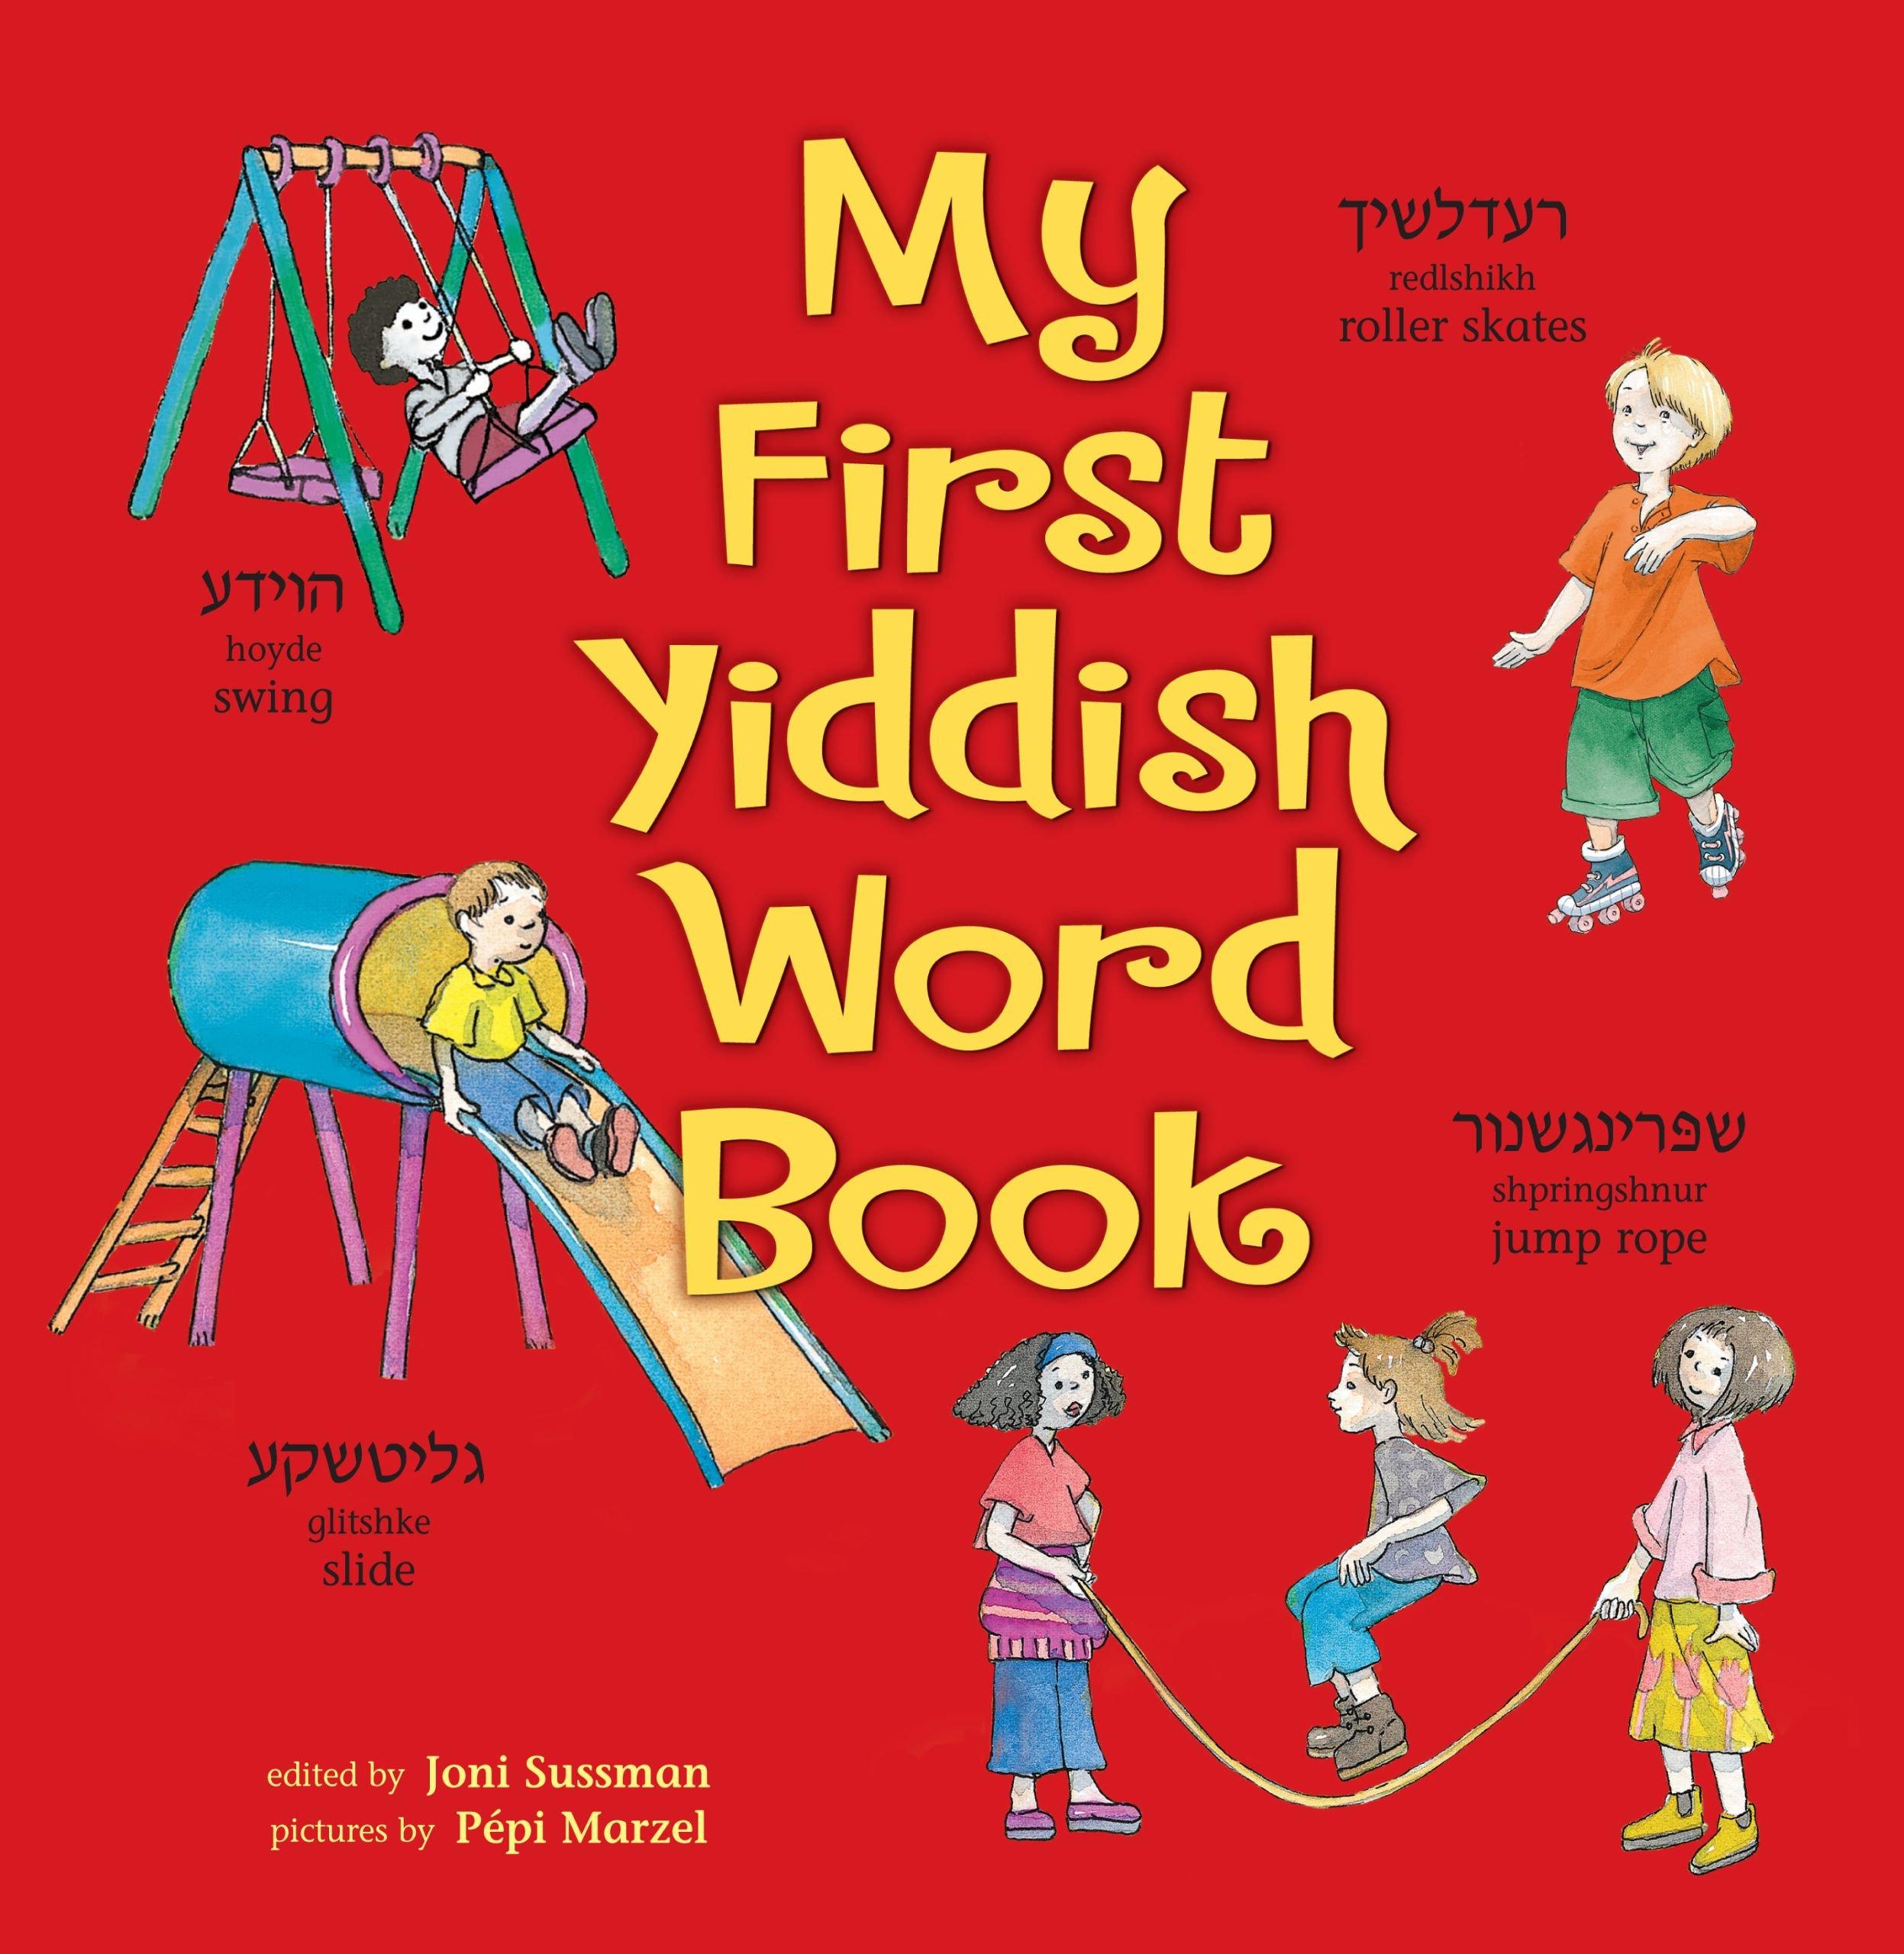 My First Yiddish Word Book (Israel) (English and Yiddish Edition)